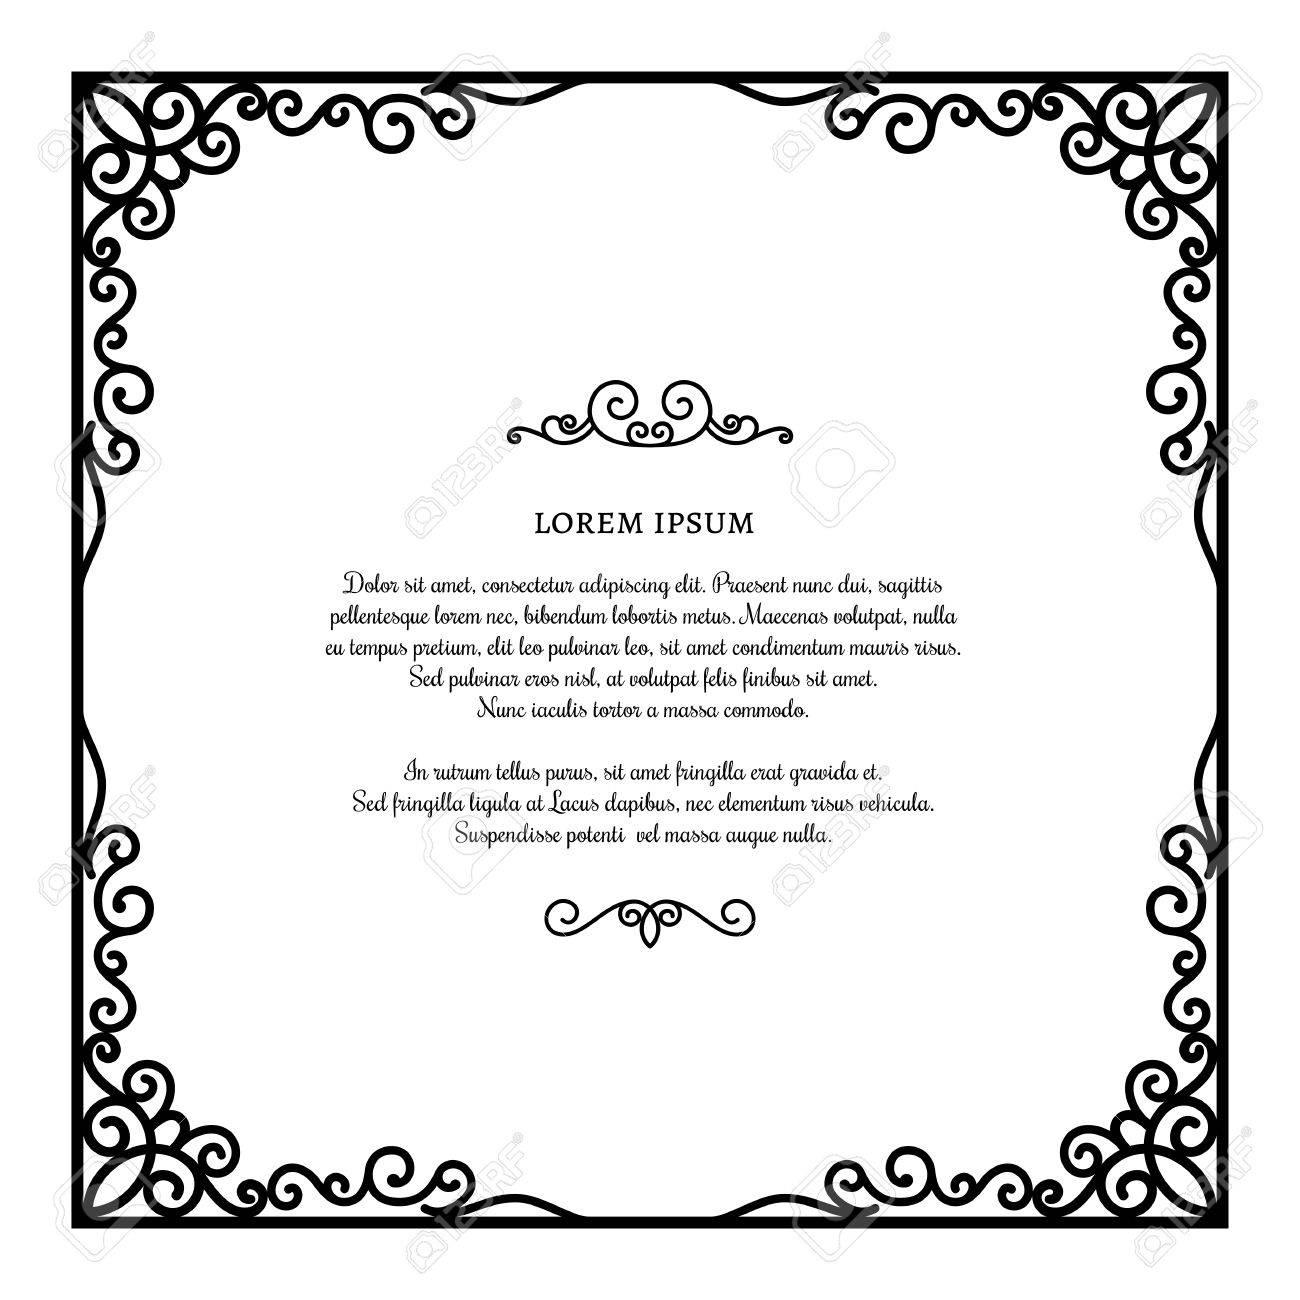 Gemütlich Billiges Zertifikat Rahmen Ideen - Rahmen Ideen ...